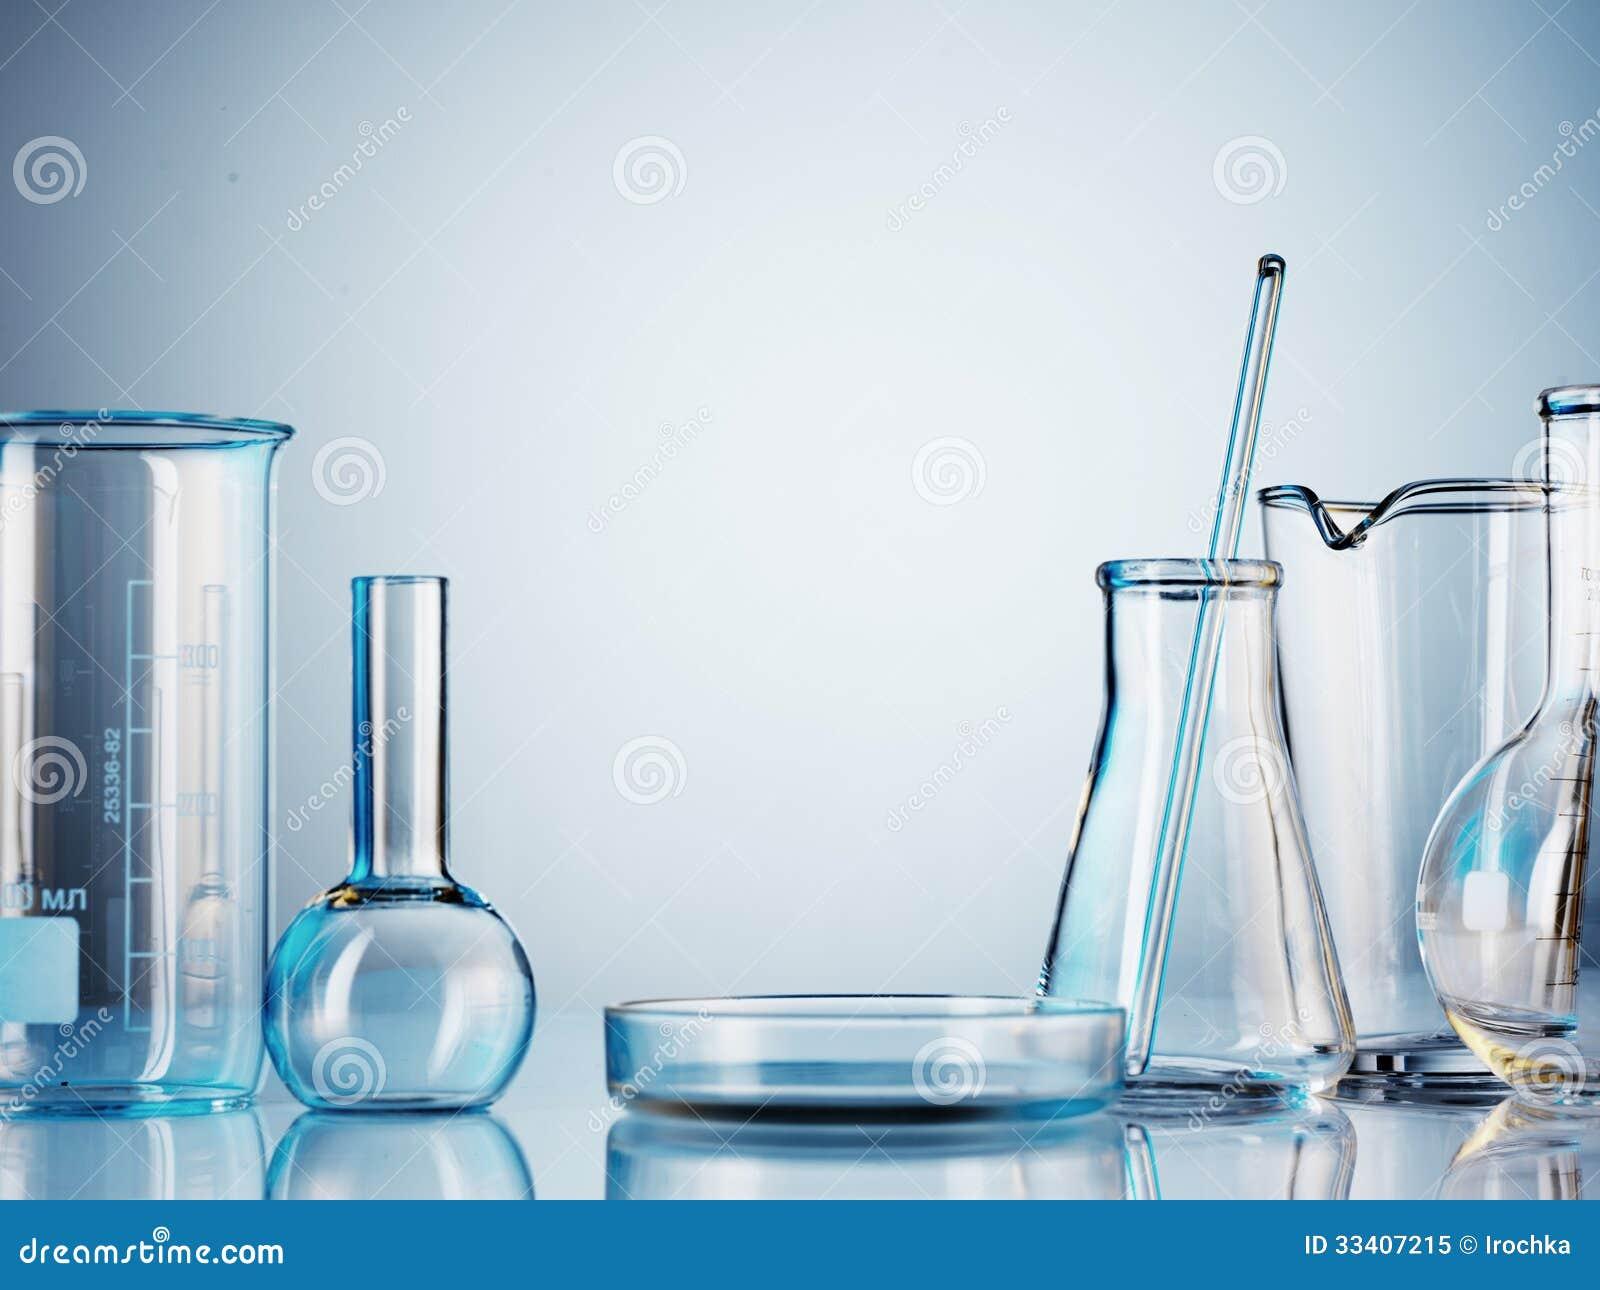 chemistry liquid breathing